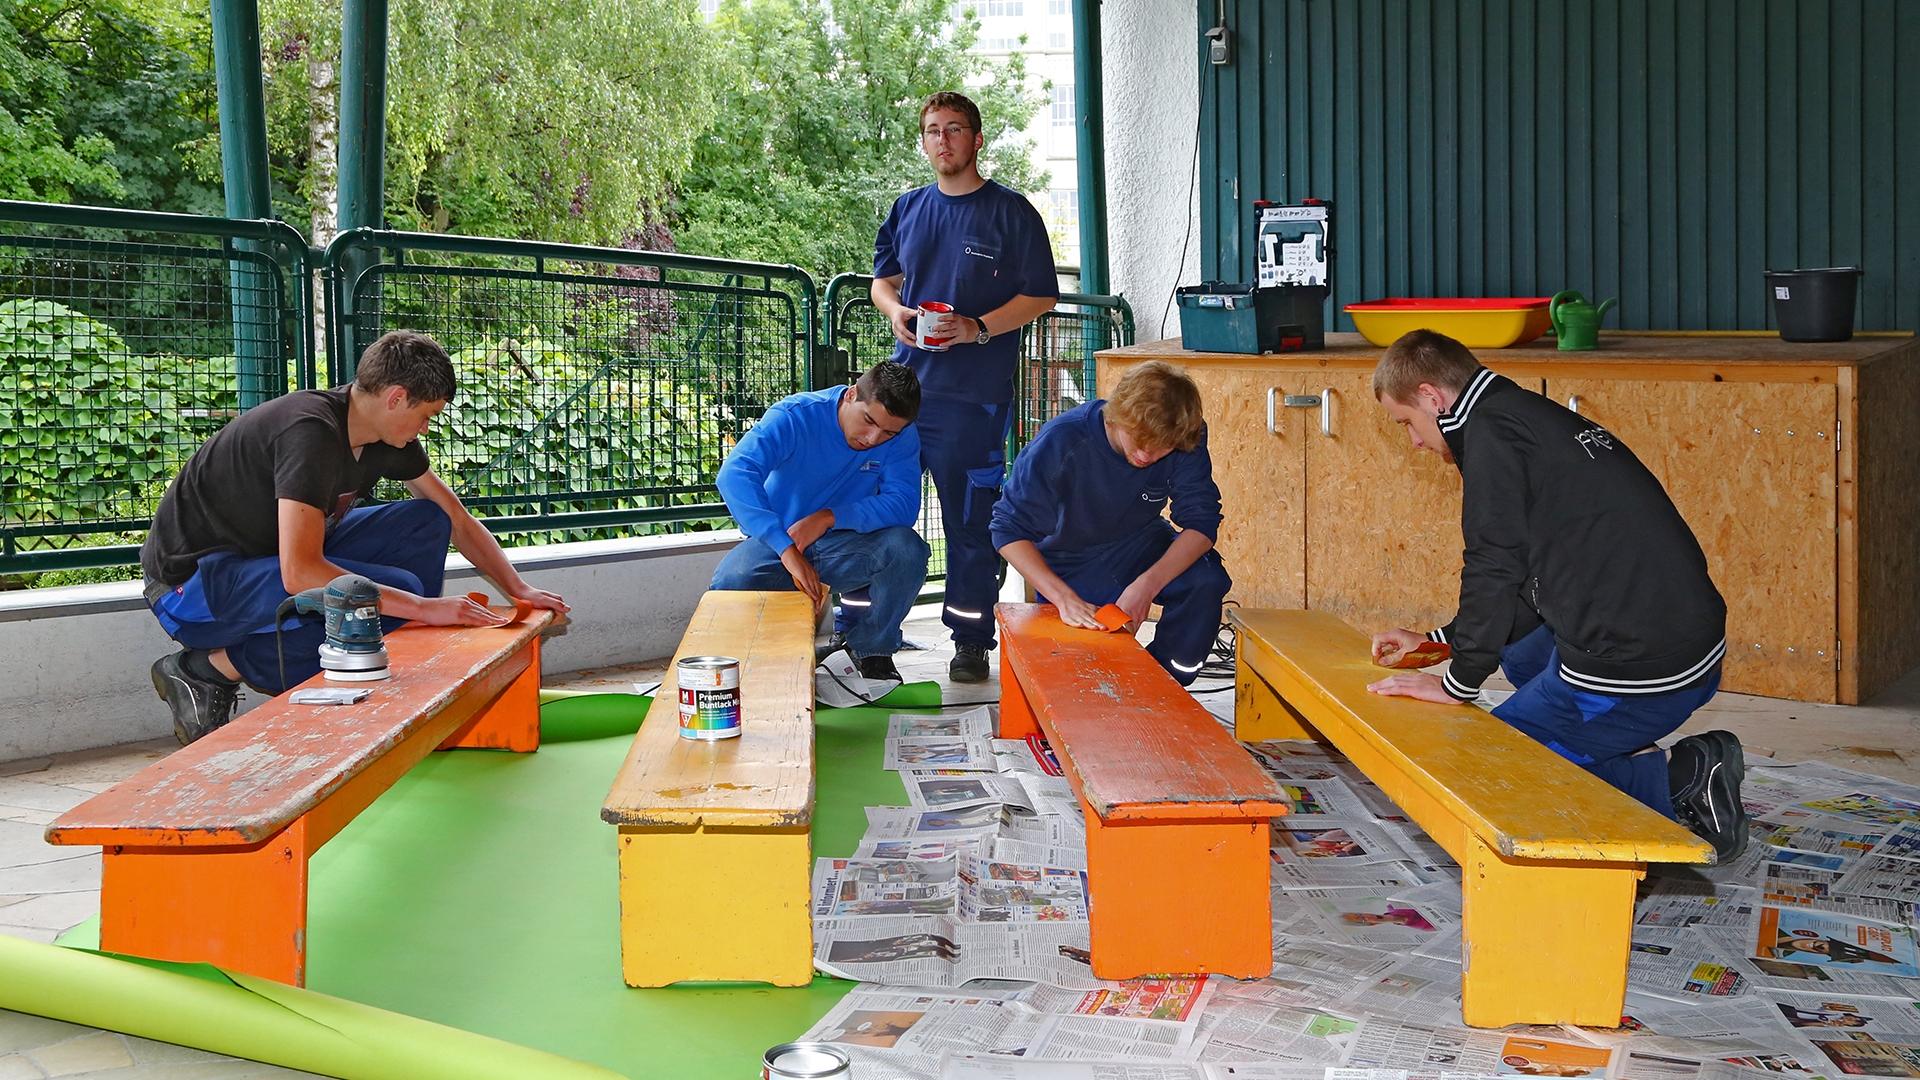 Sozialer Tag Stadtwerke Augsburg - Foto: Freiwilligen-Zentrum Augsburg